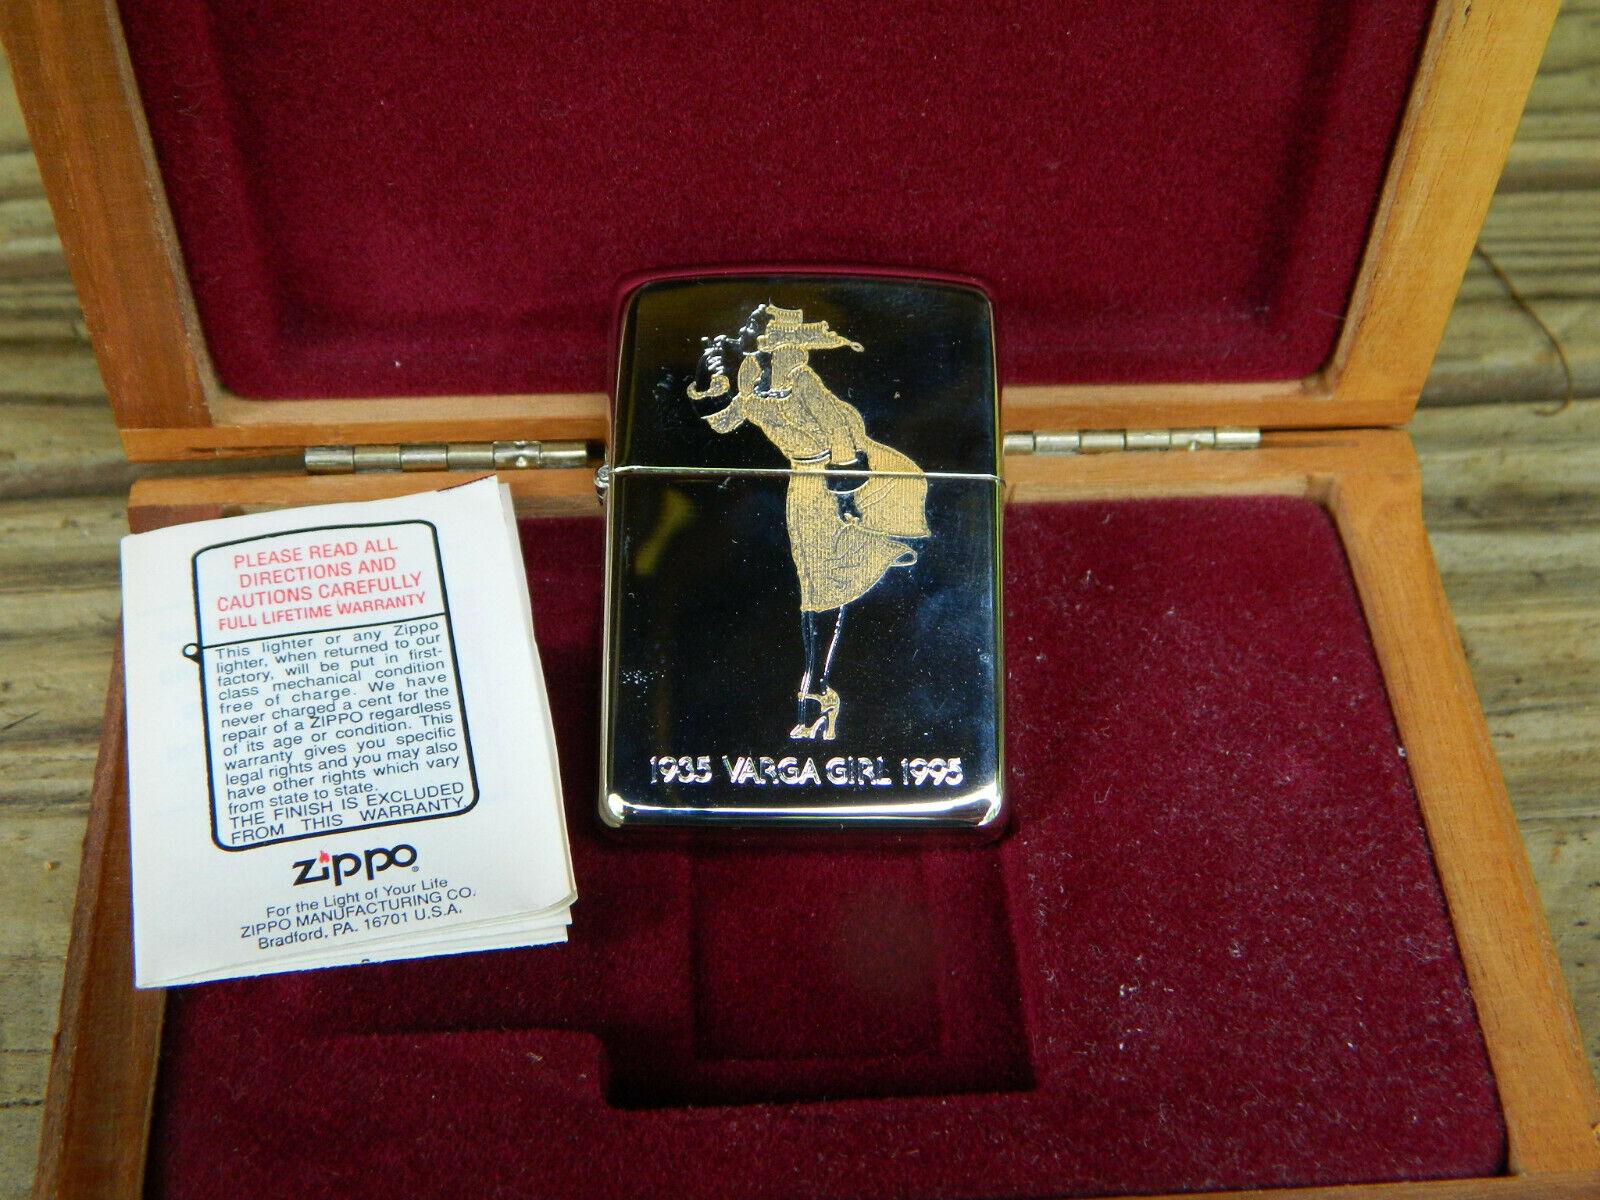 1935 VARGA GIRL 1995 LIMITED EDITION ZIPPO LIGHTER WOOD BOX